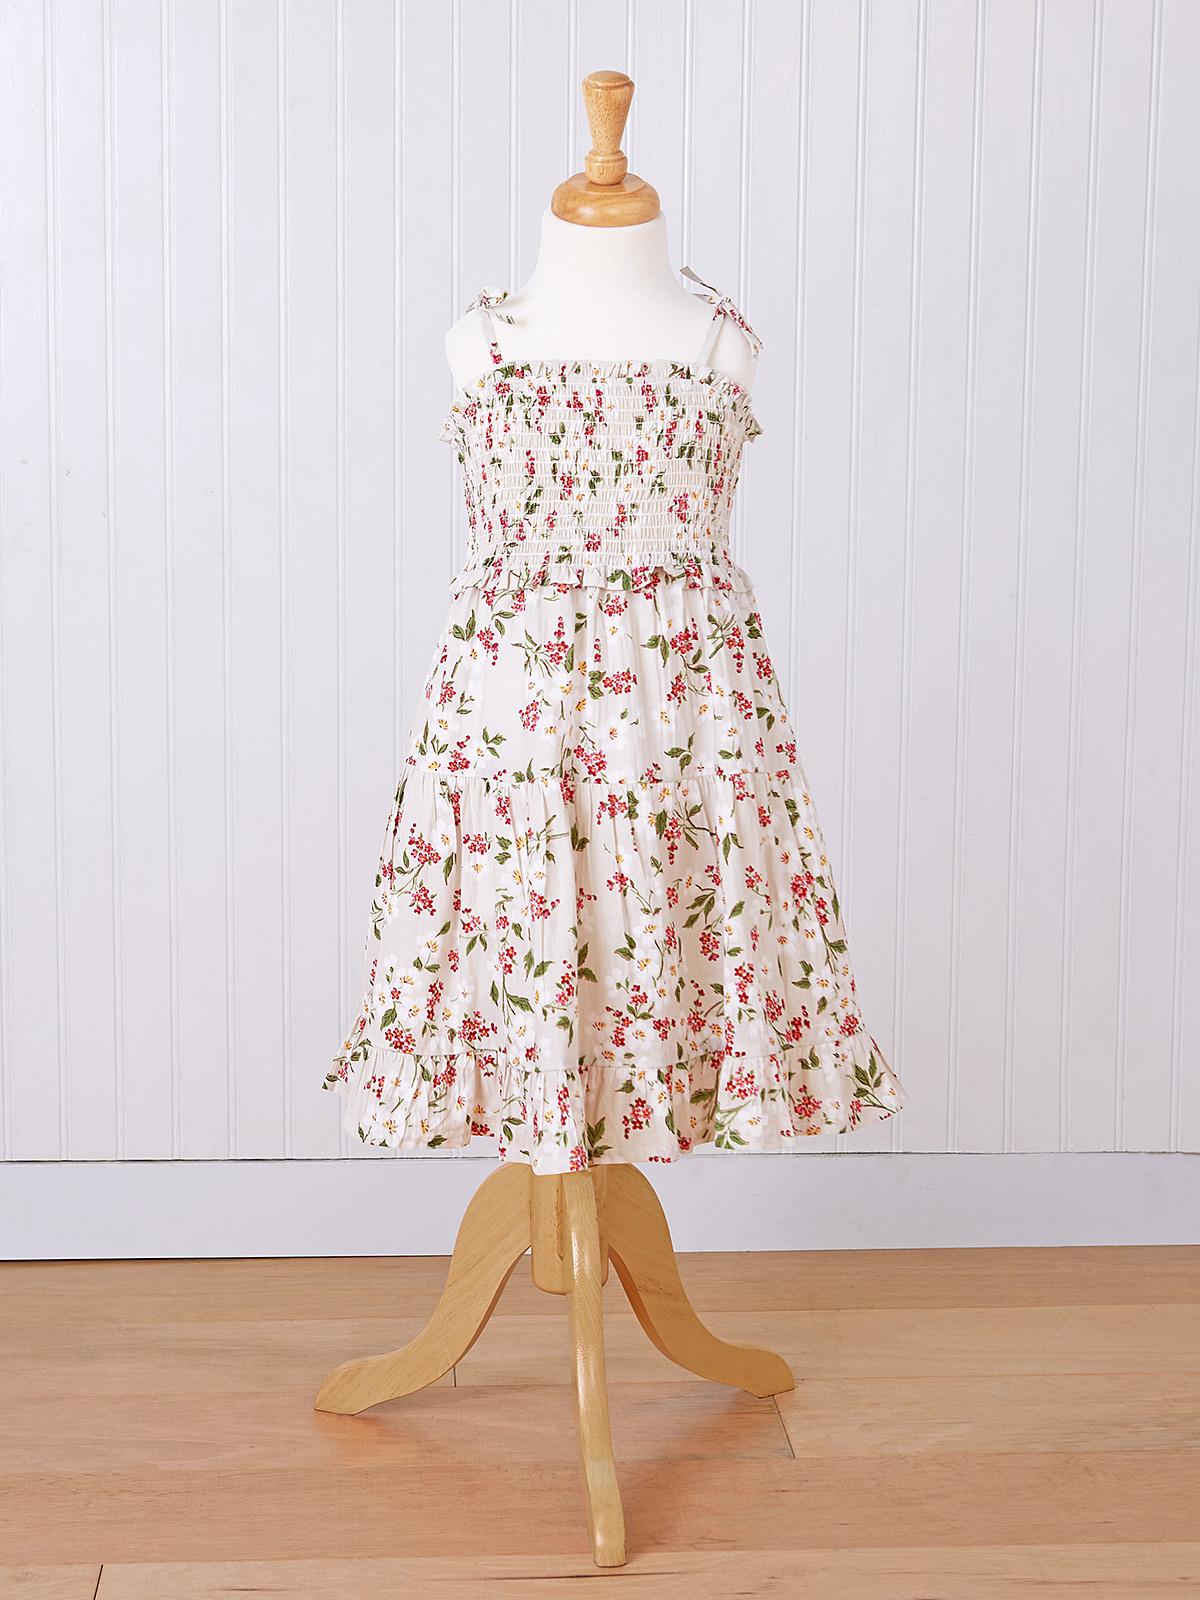 Strawberry Smocked Girls Dress